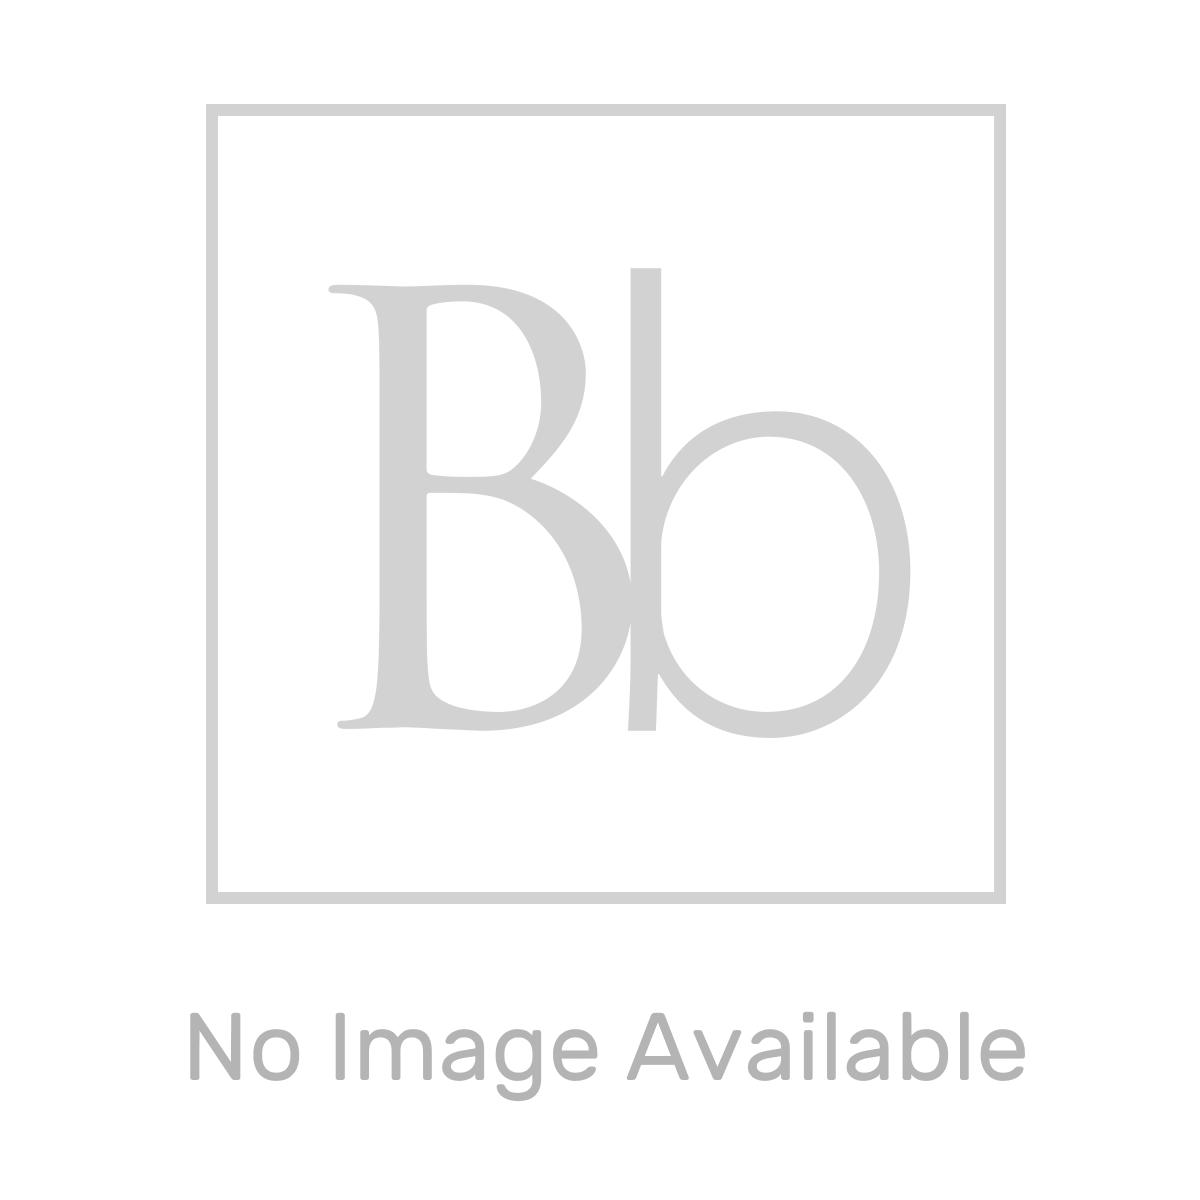 Nuie Athena Stone Grey 2 Drawer Floor Standing Vanity Unit with 18mm Worktop 800mm Line Drawing